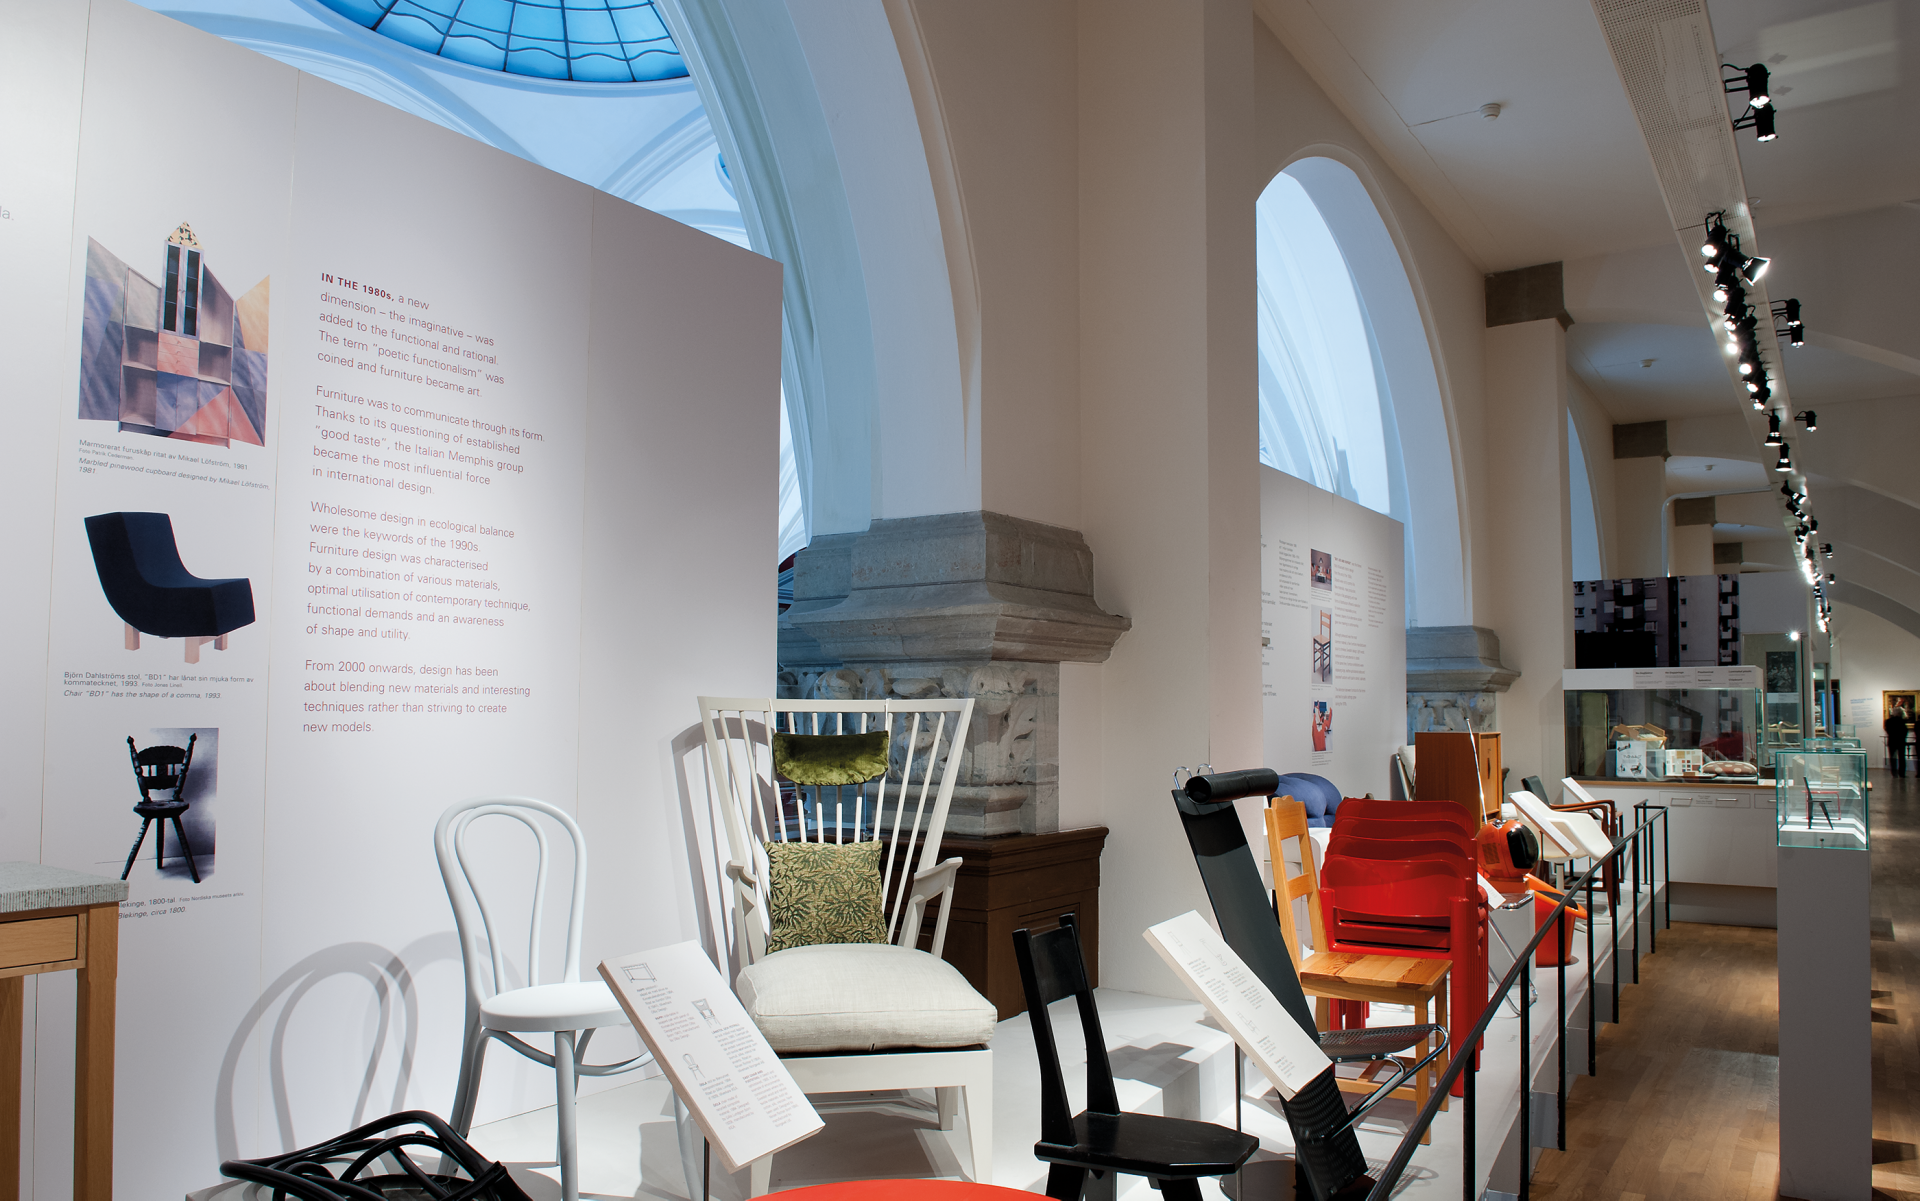 Foto: Karolina Kristensson/ Nordiska museet.